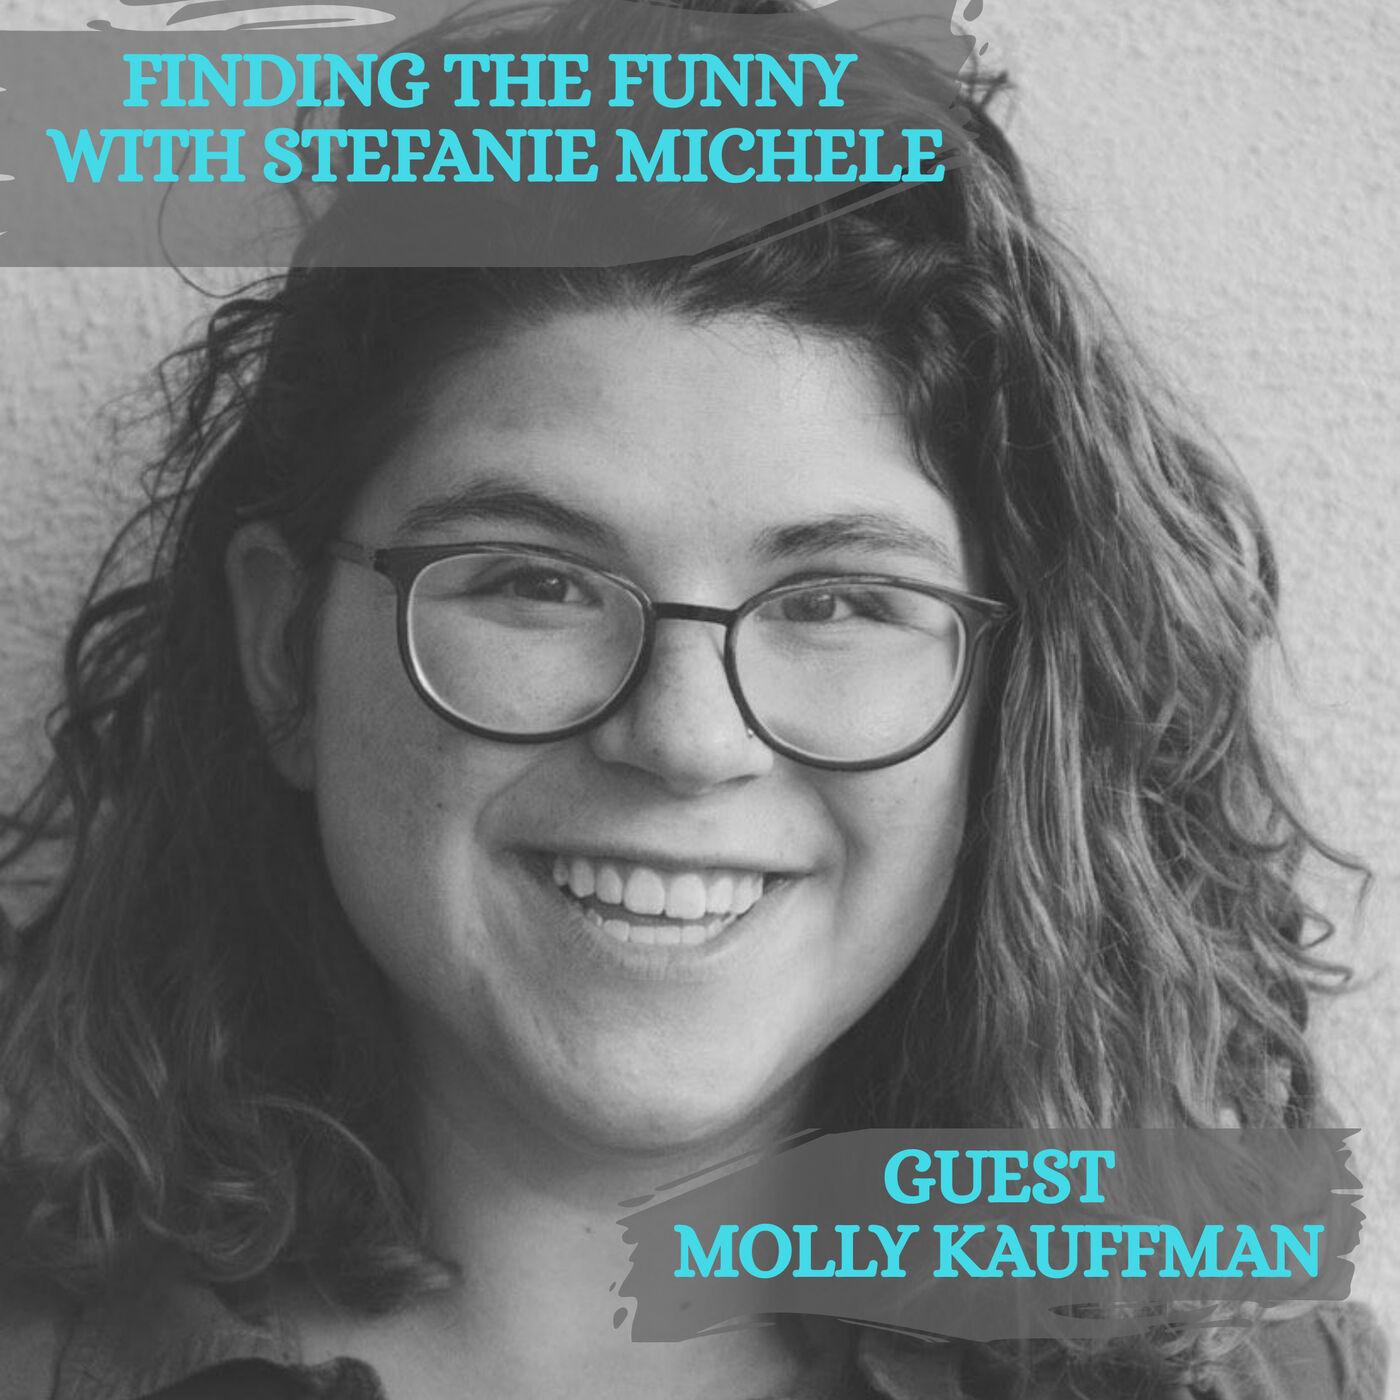 Molly Kauffman